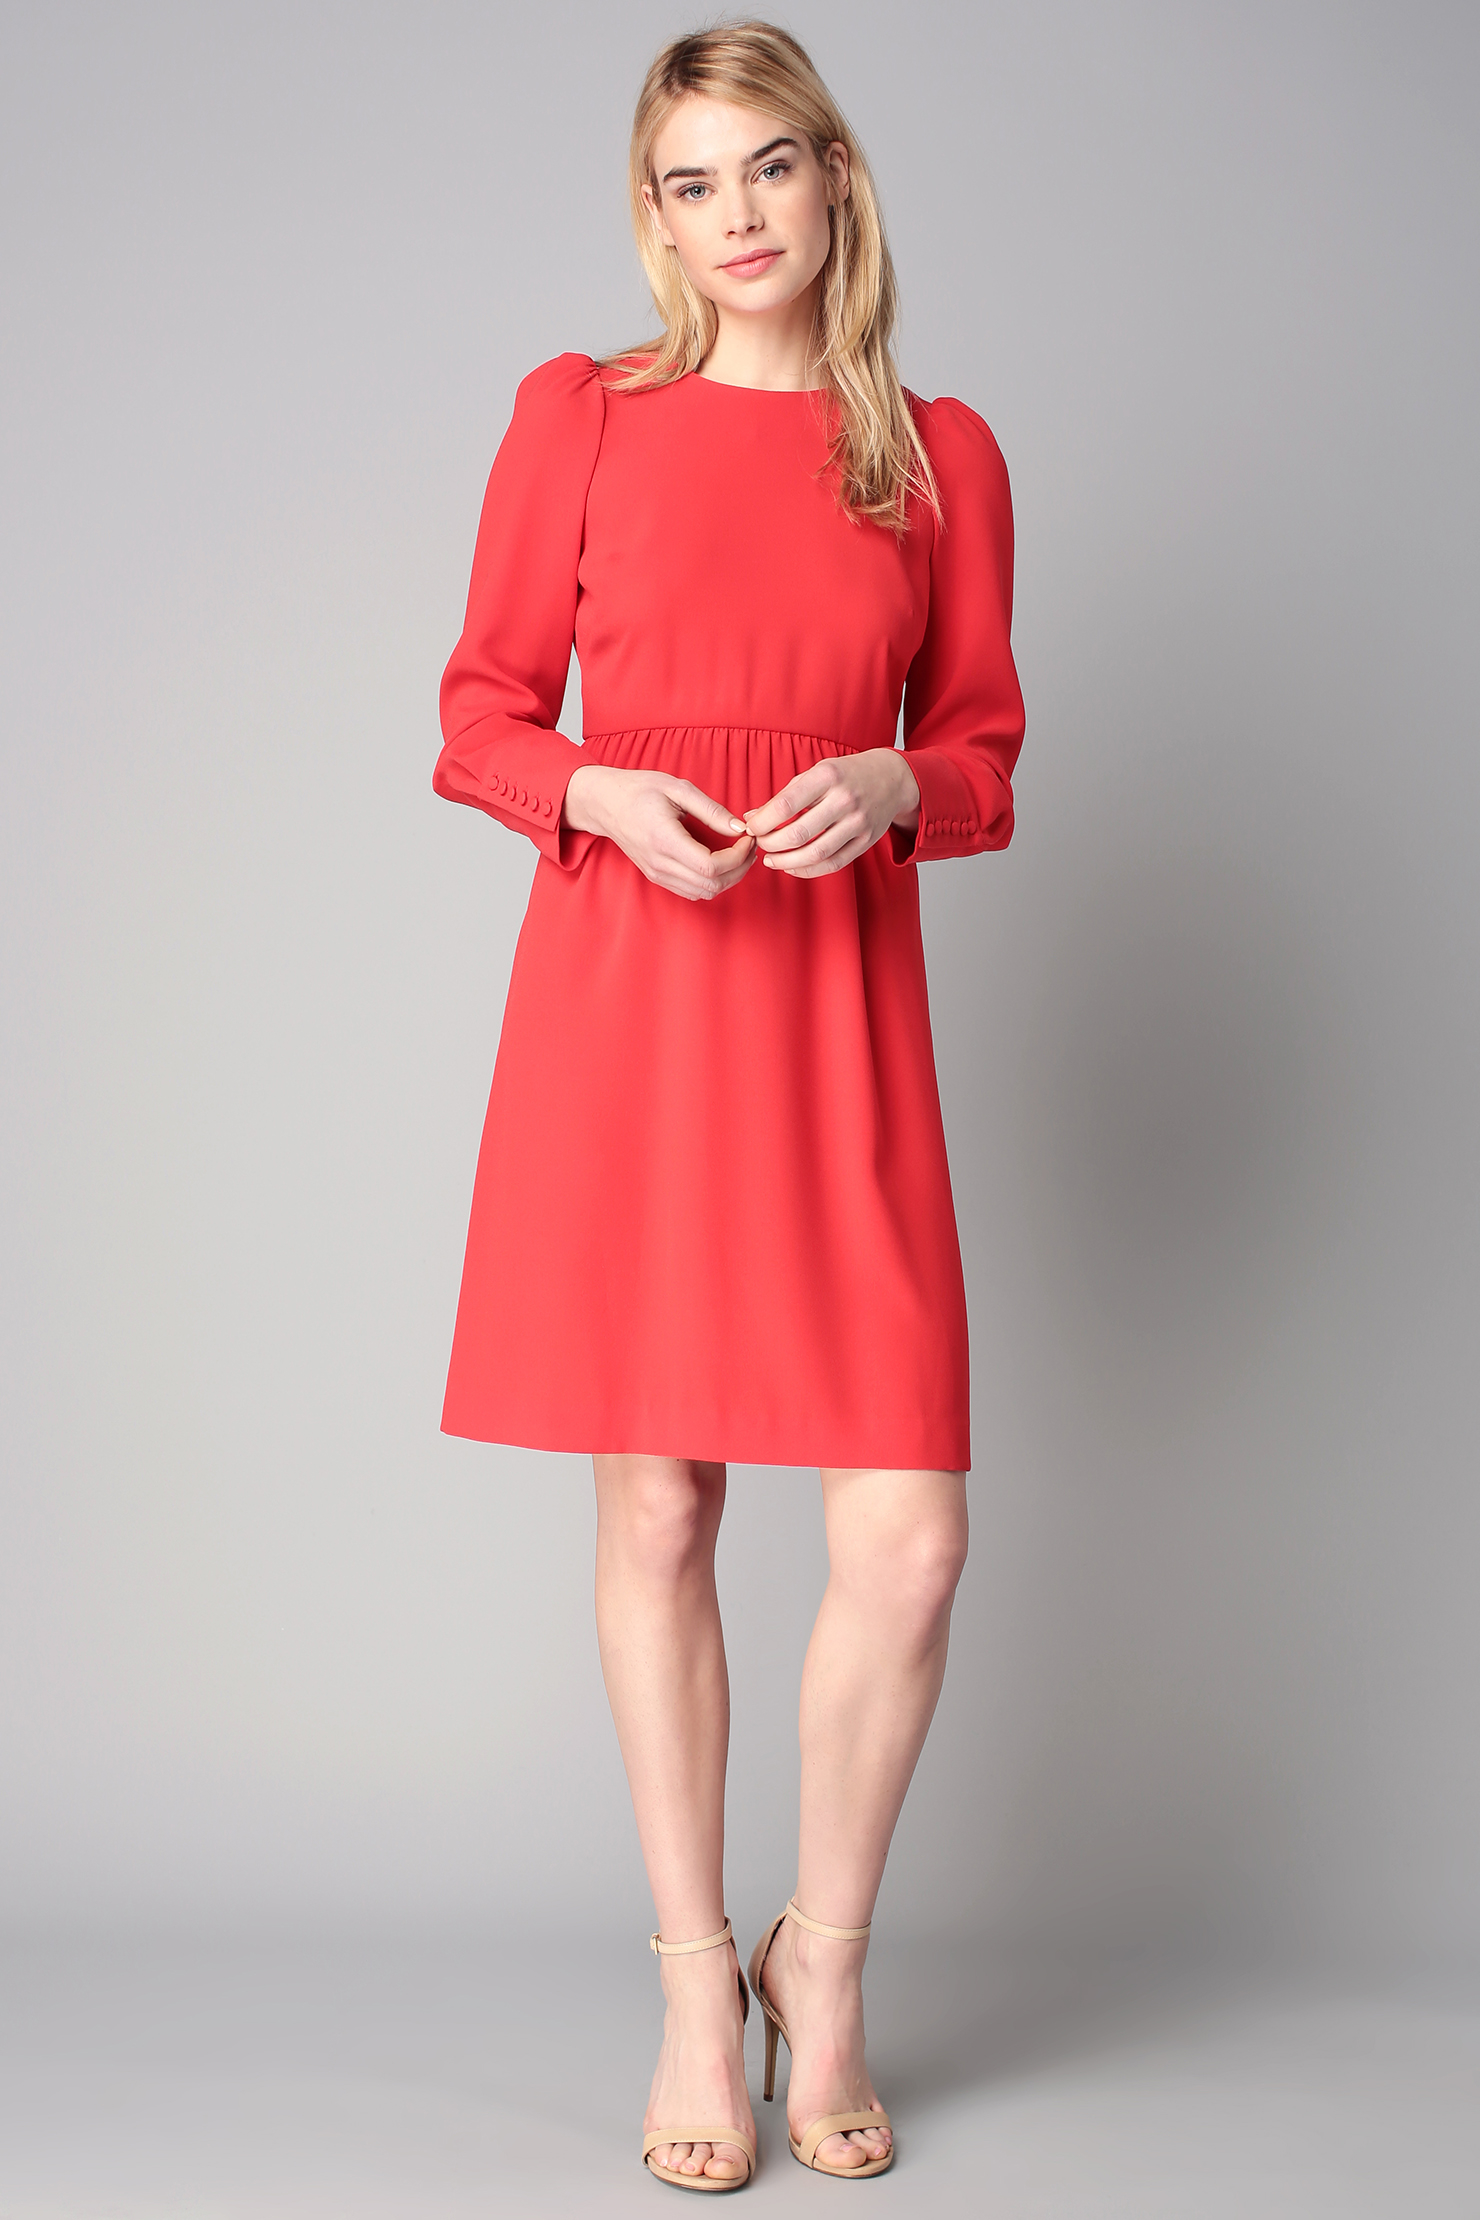 Tara jarmon robe rouge 2015